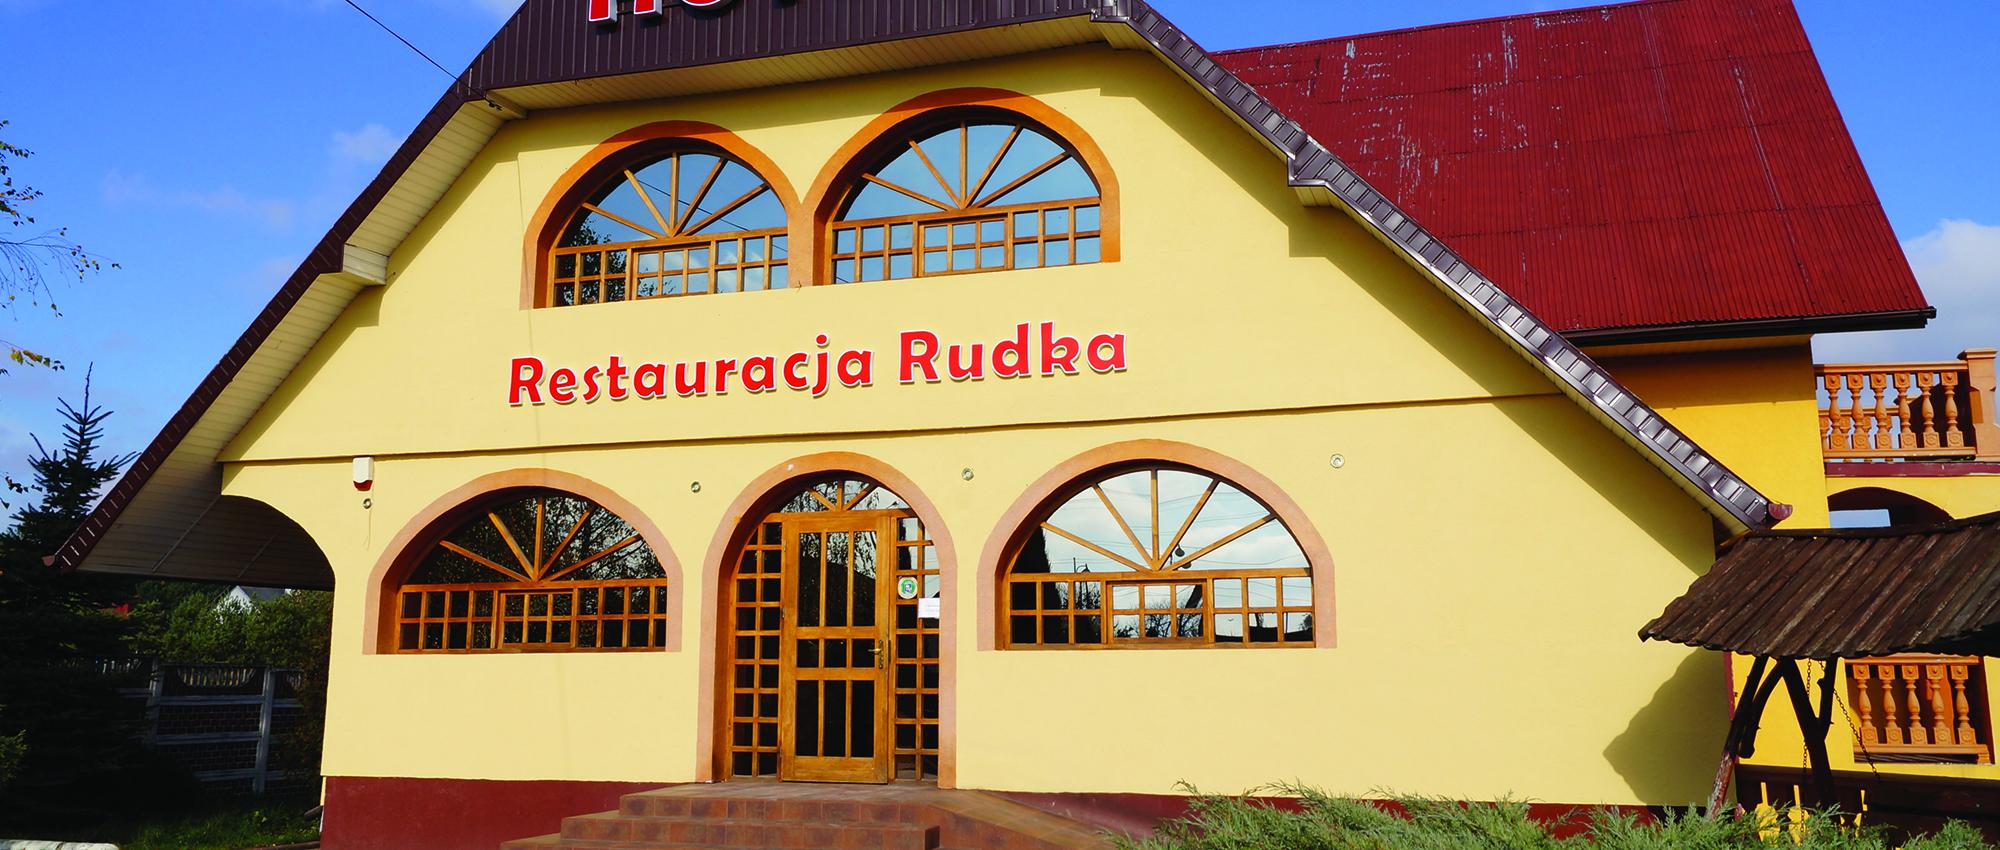 http://hotelrudka.pl/wp-content/uploads/2018/02/1.jpg